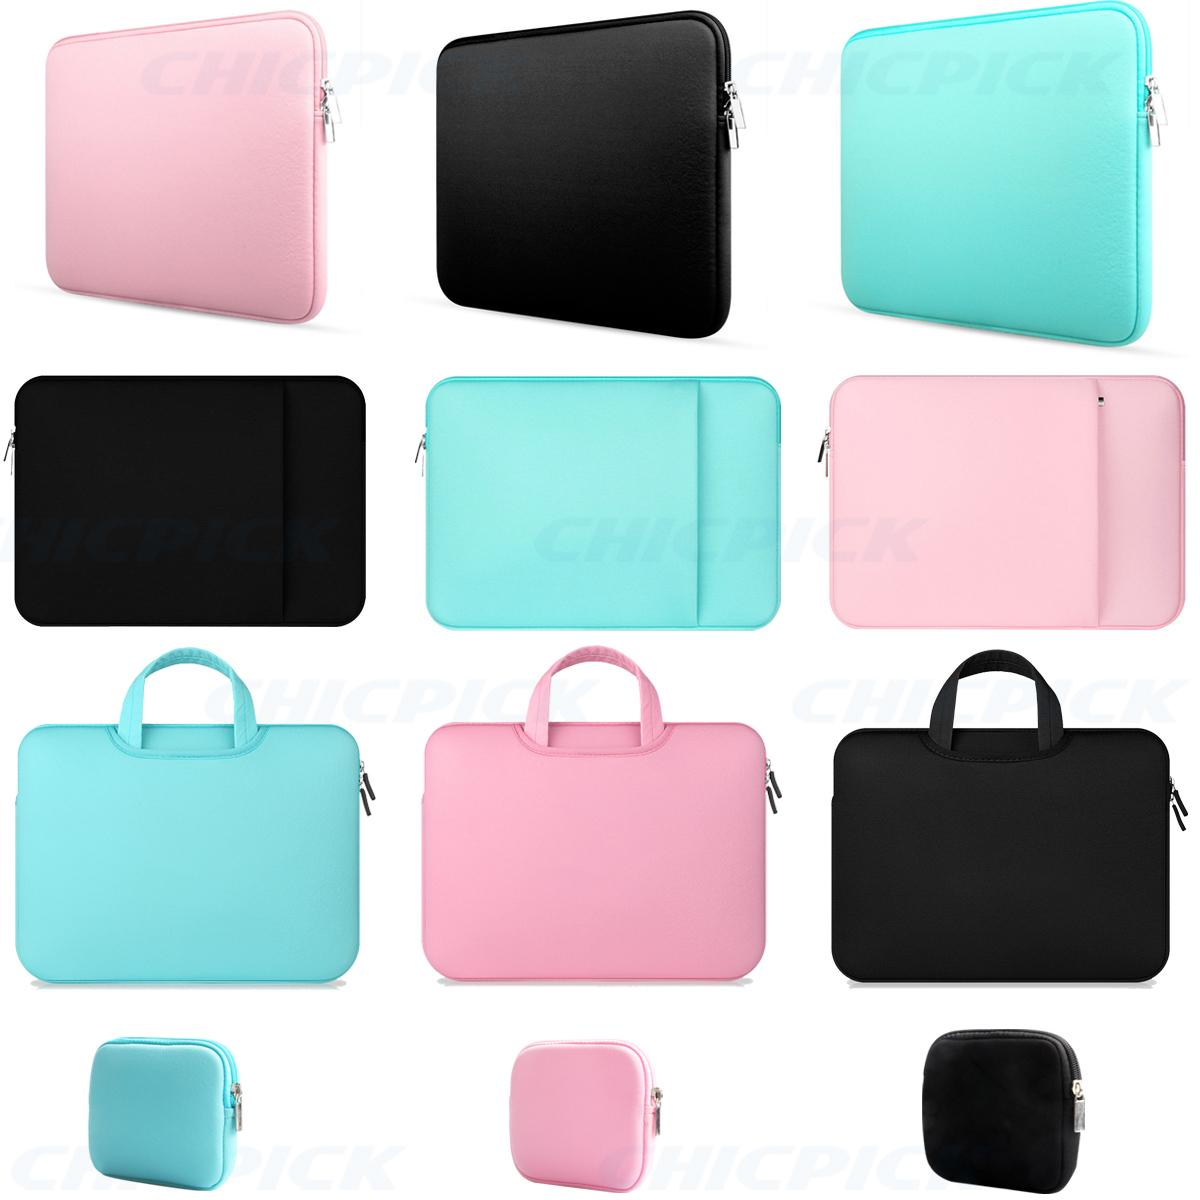 "11"" 12 ""13"" Macbook Mac Hava / Pro / Retina Dell Samsung için Notebook El Çantası Kol Çantası"